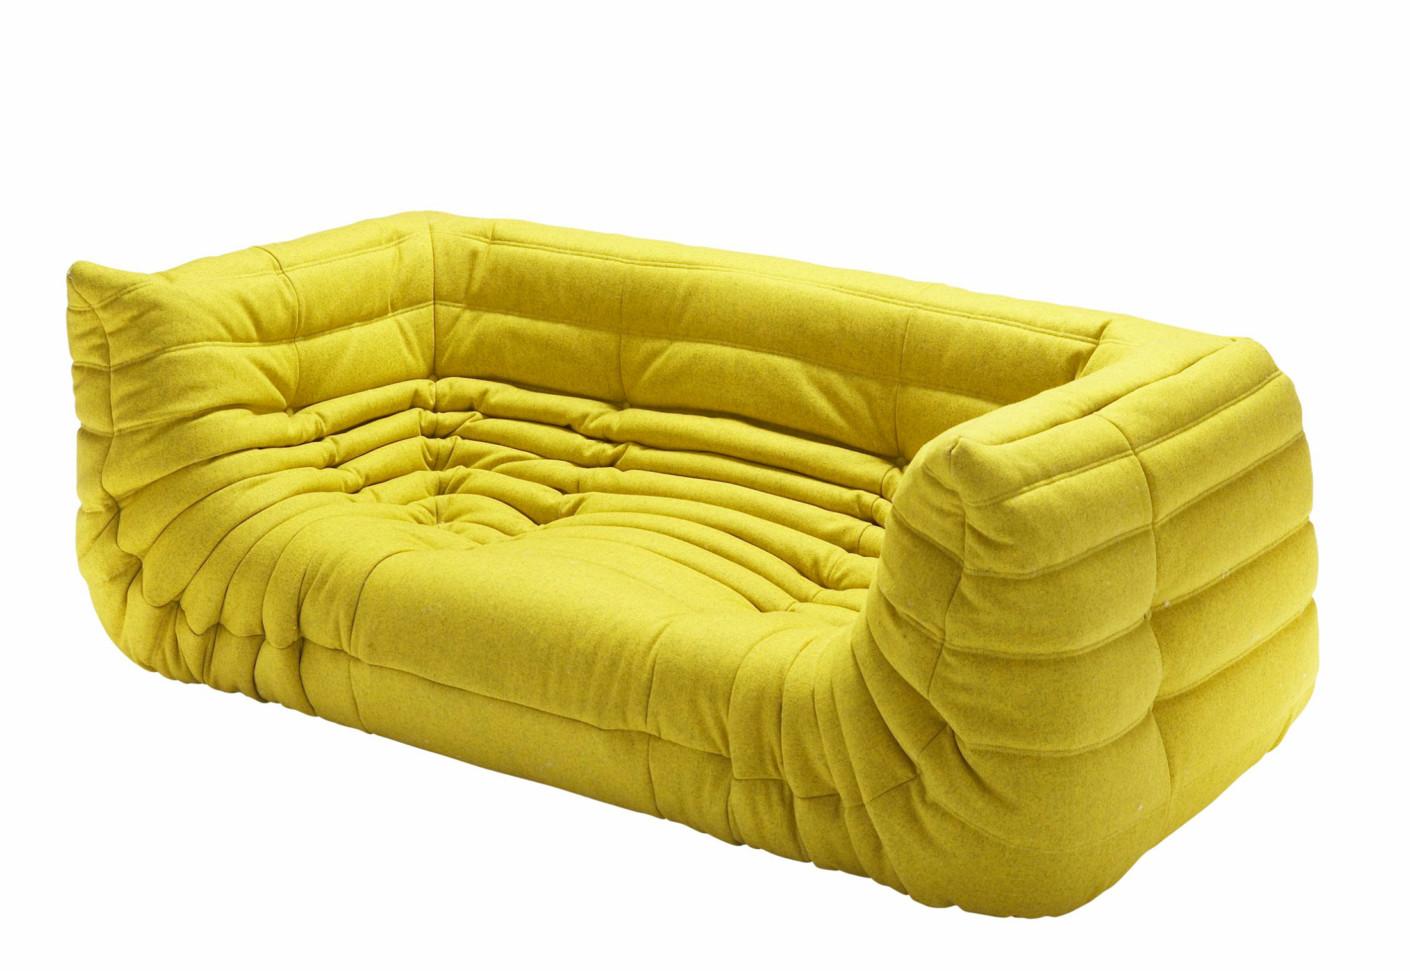 ligne roset multy sofa bed instructions